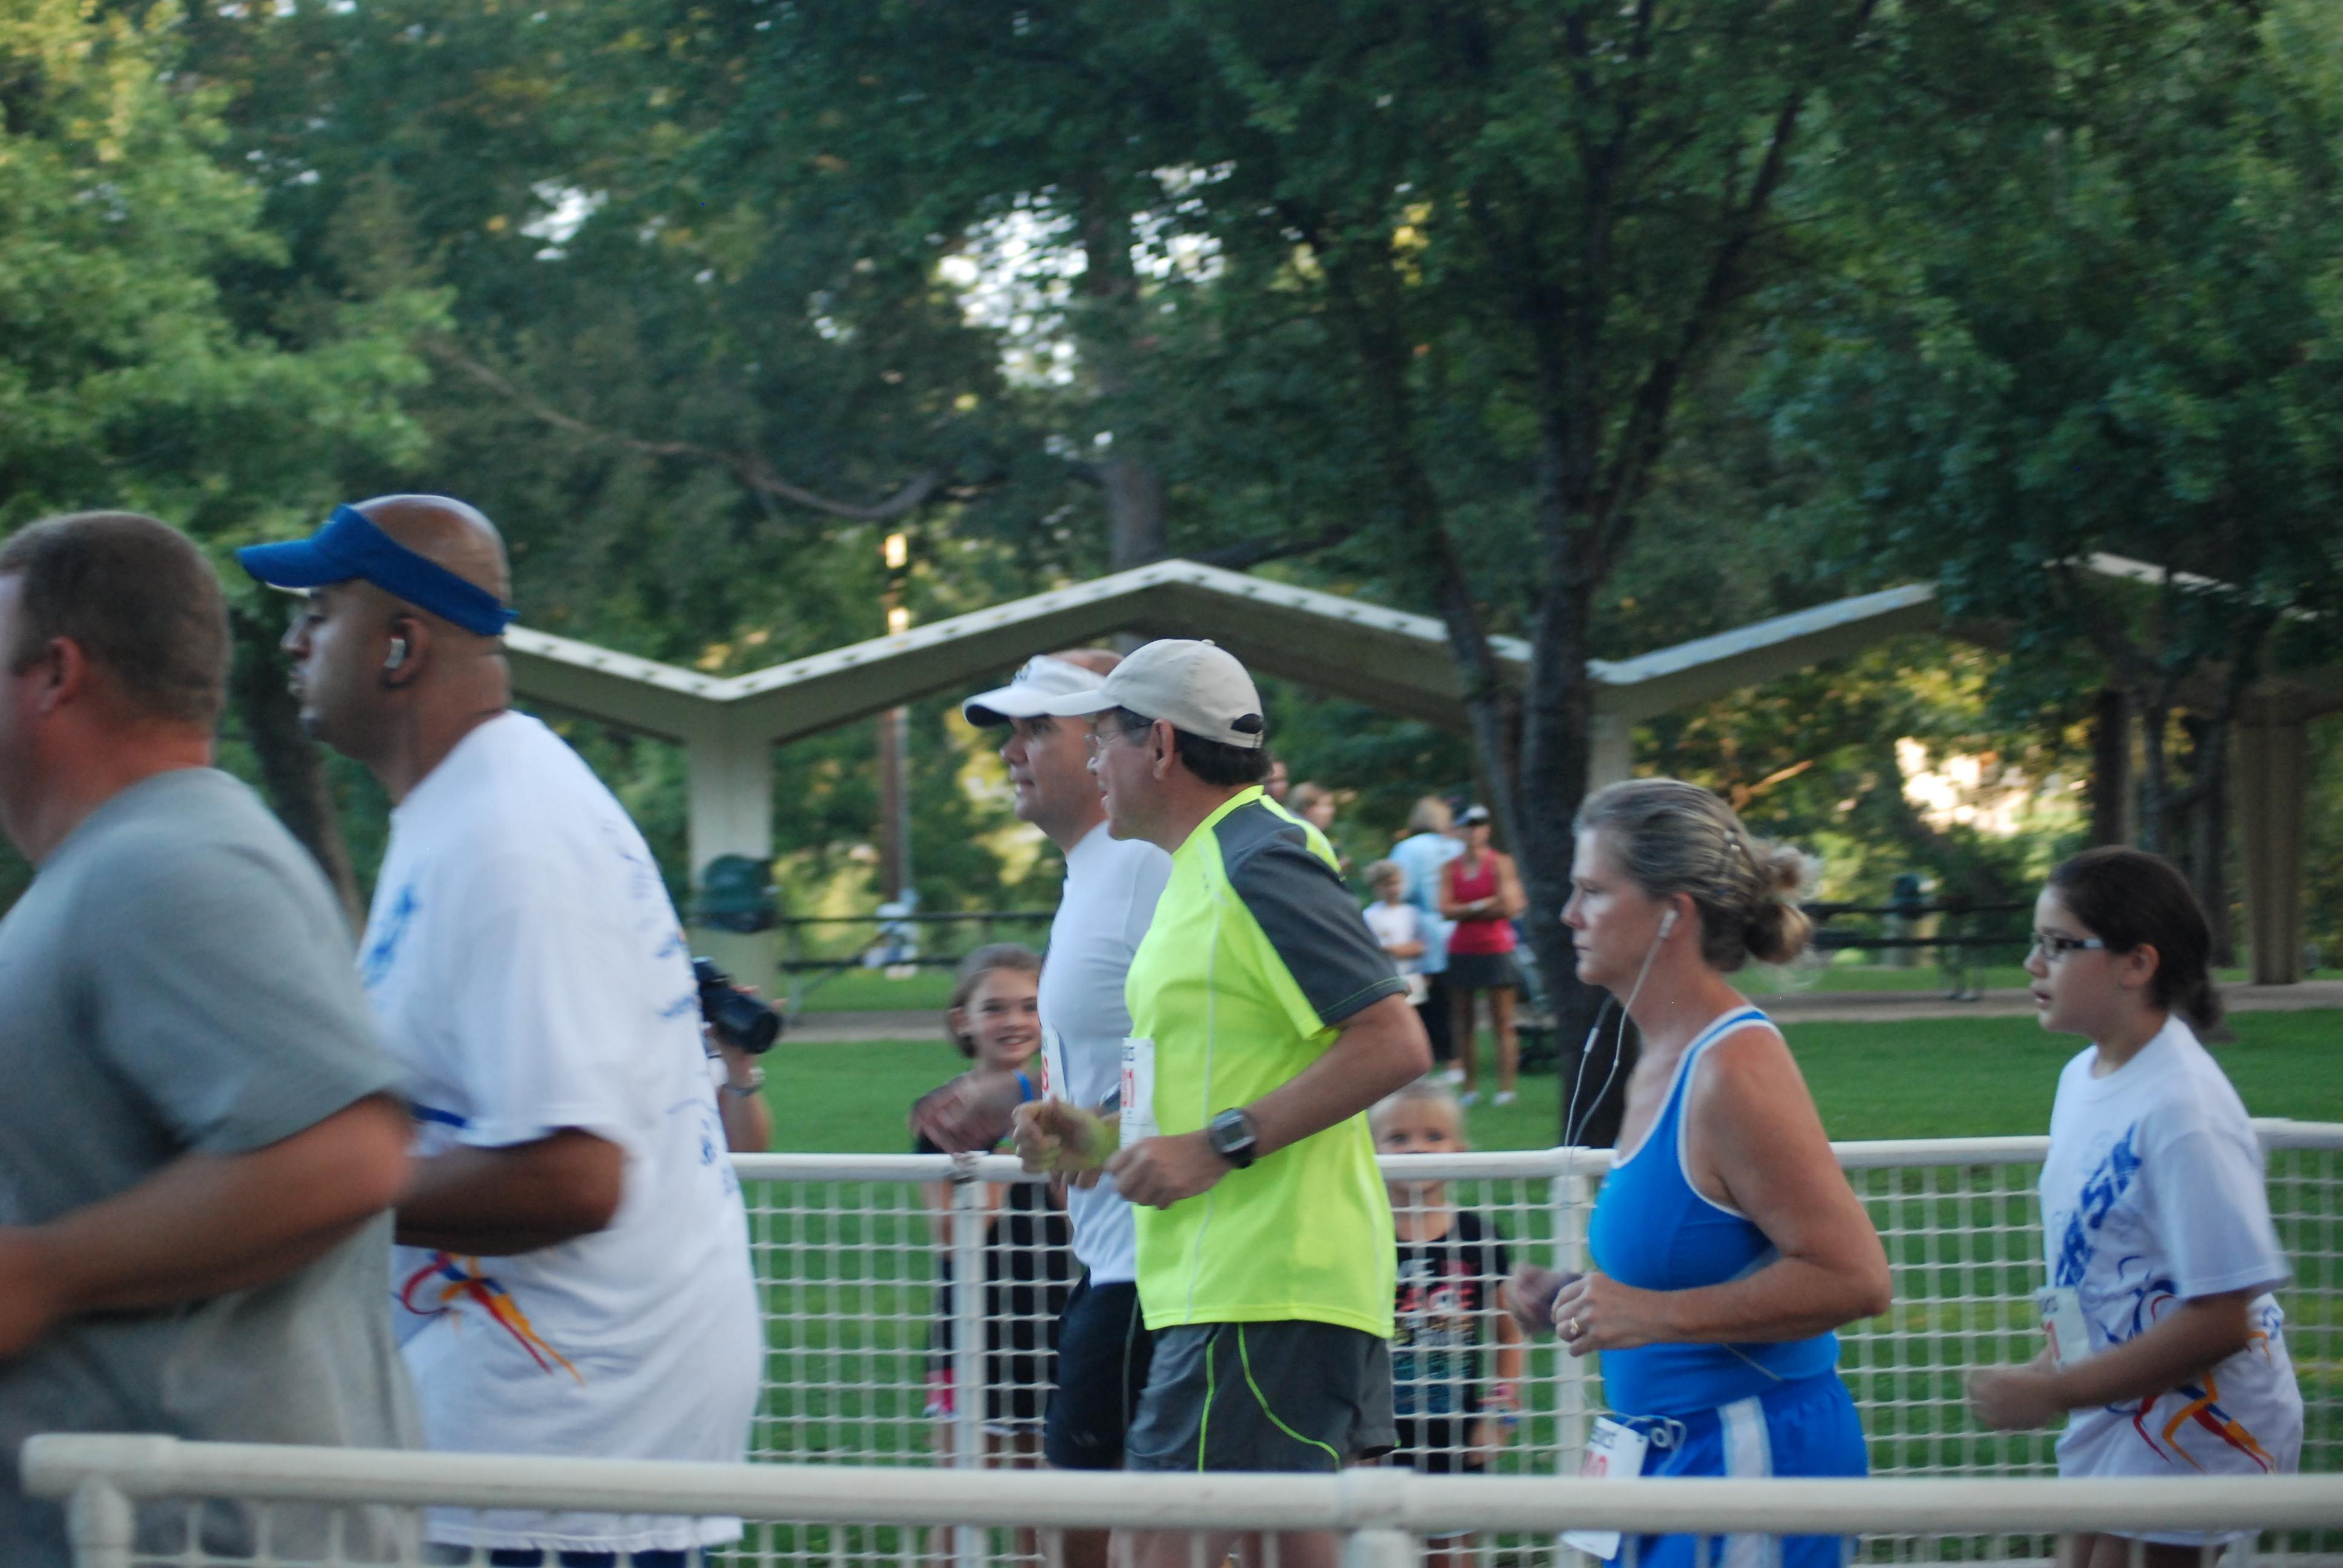 New math: 5K   10 miles = 66 #204371